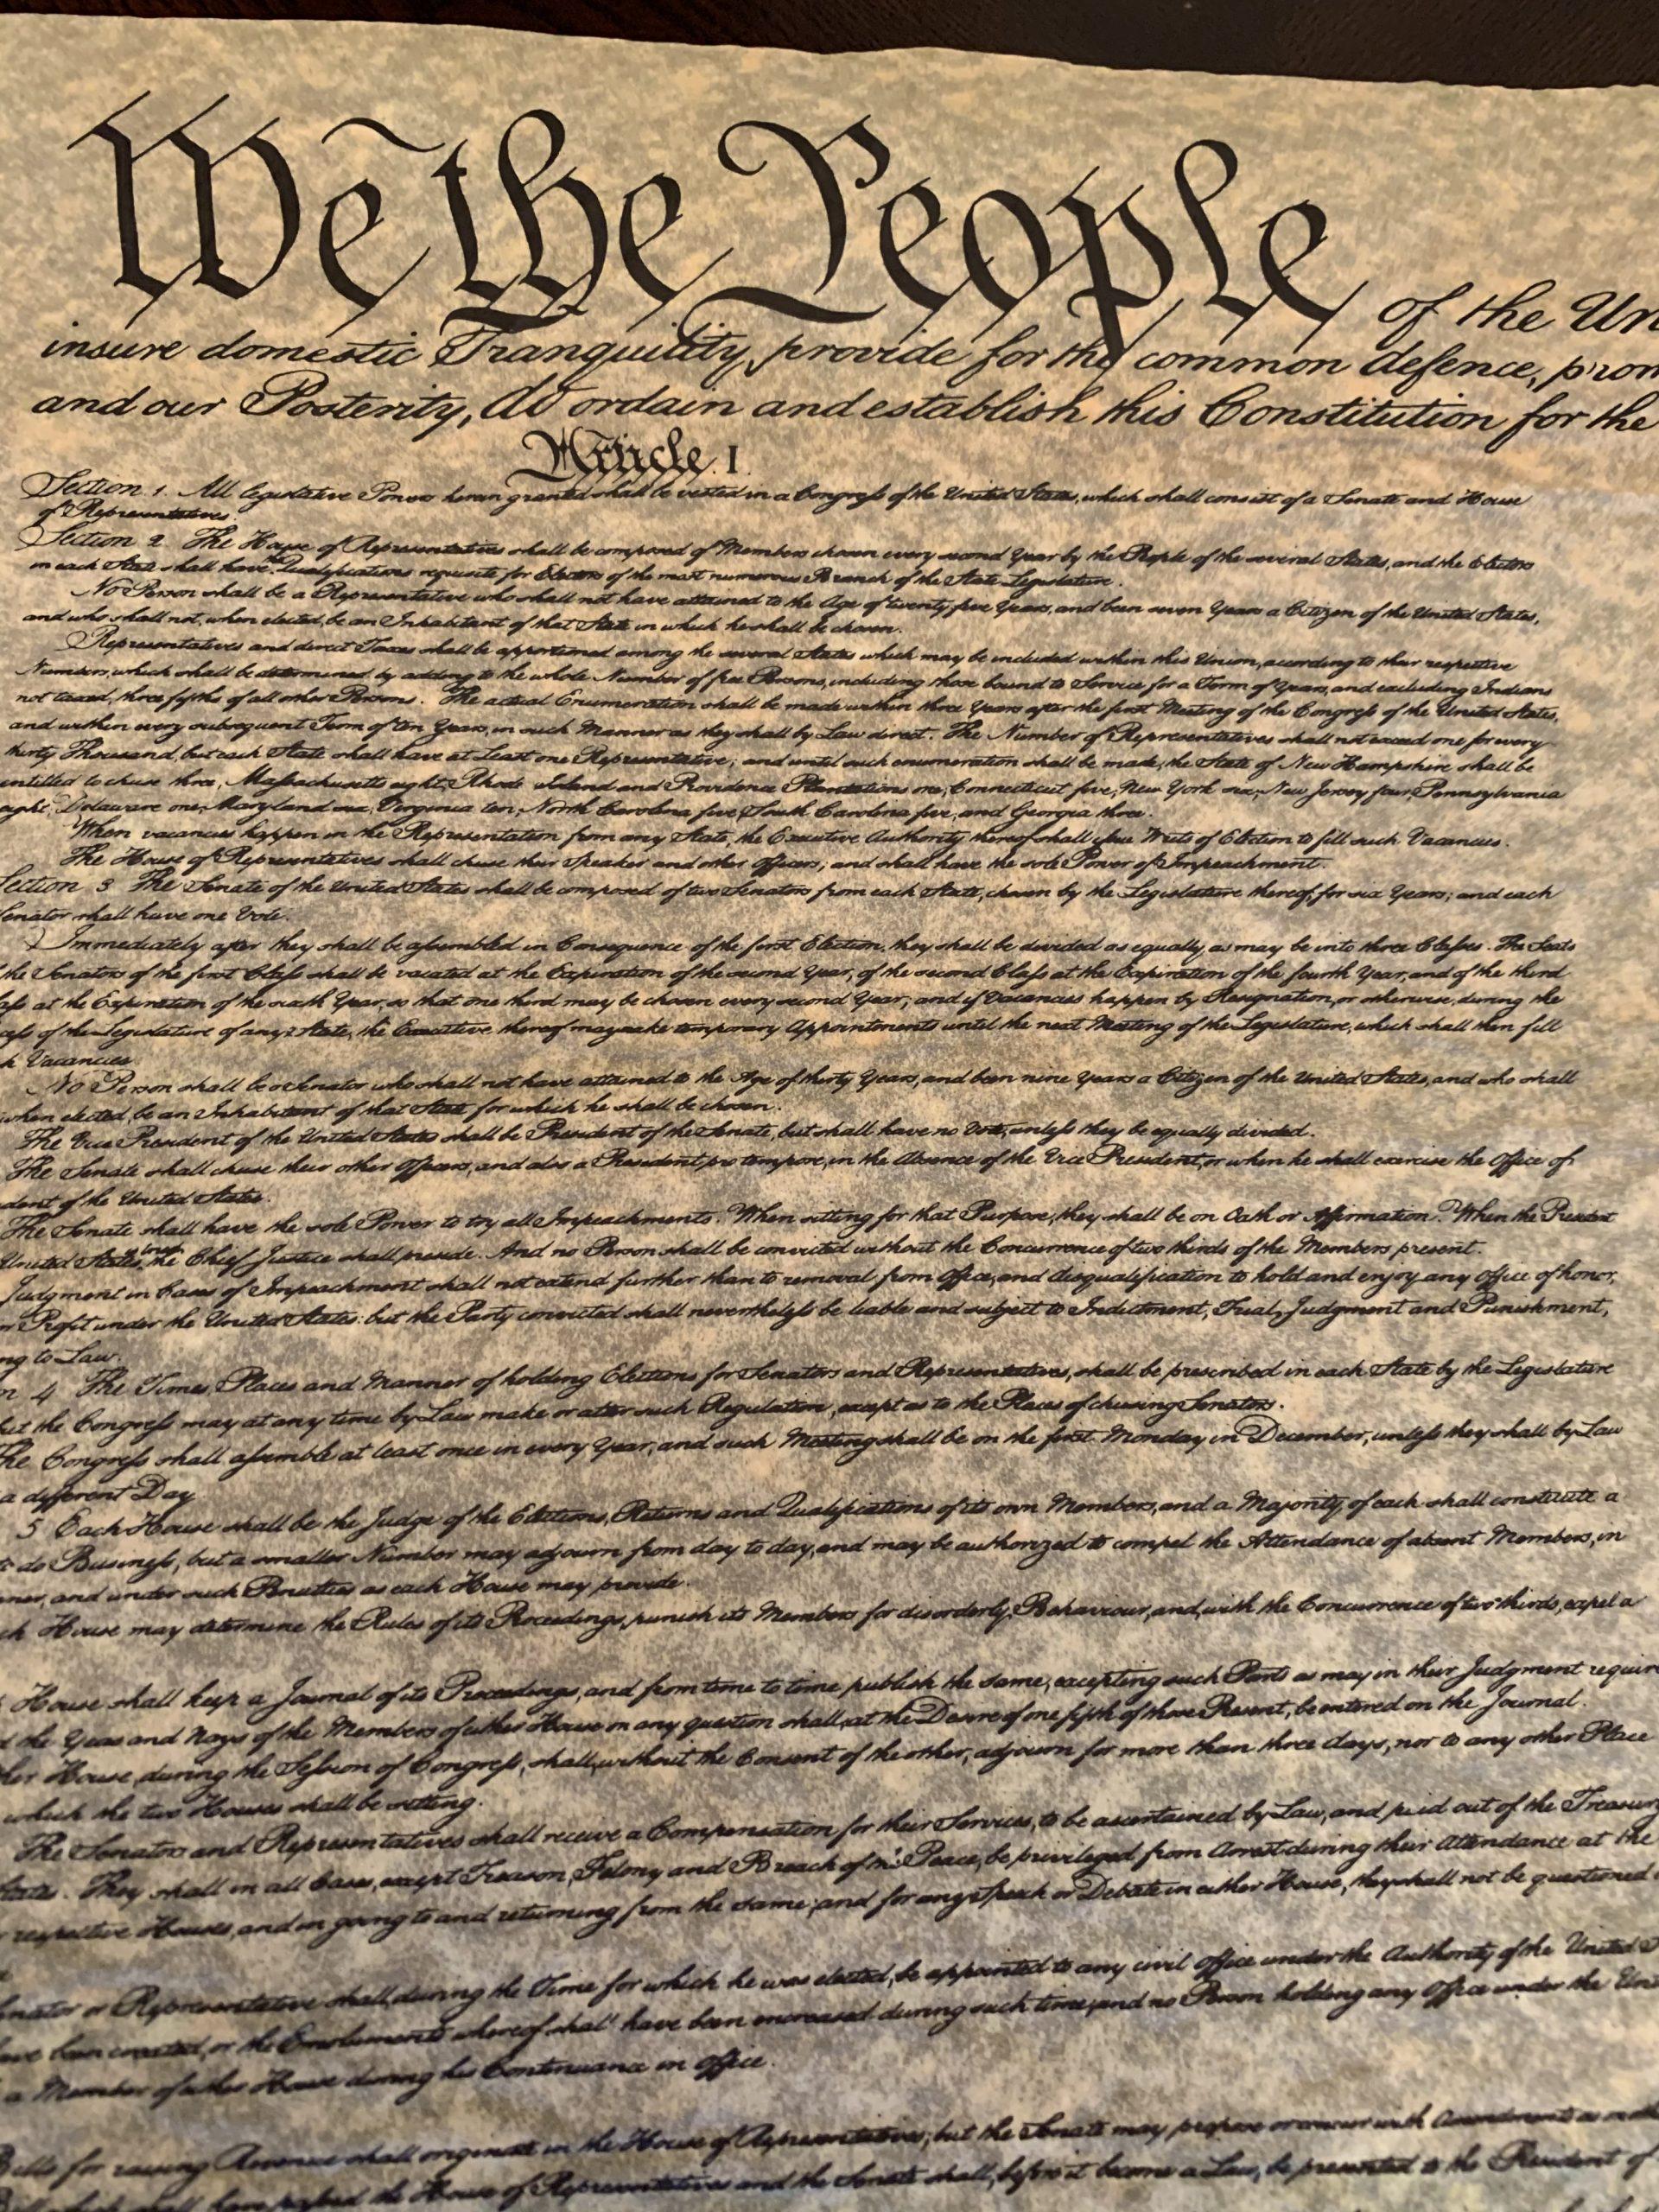 Constitution Parchment Replica Poster - 23W x 29H